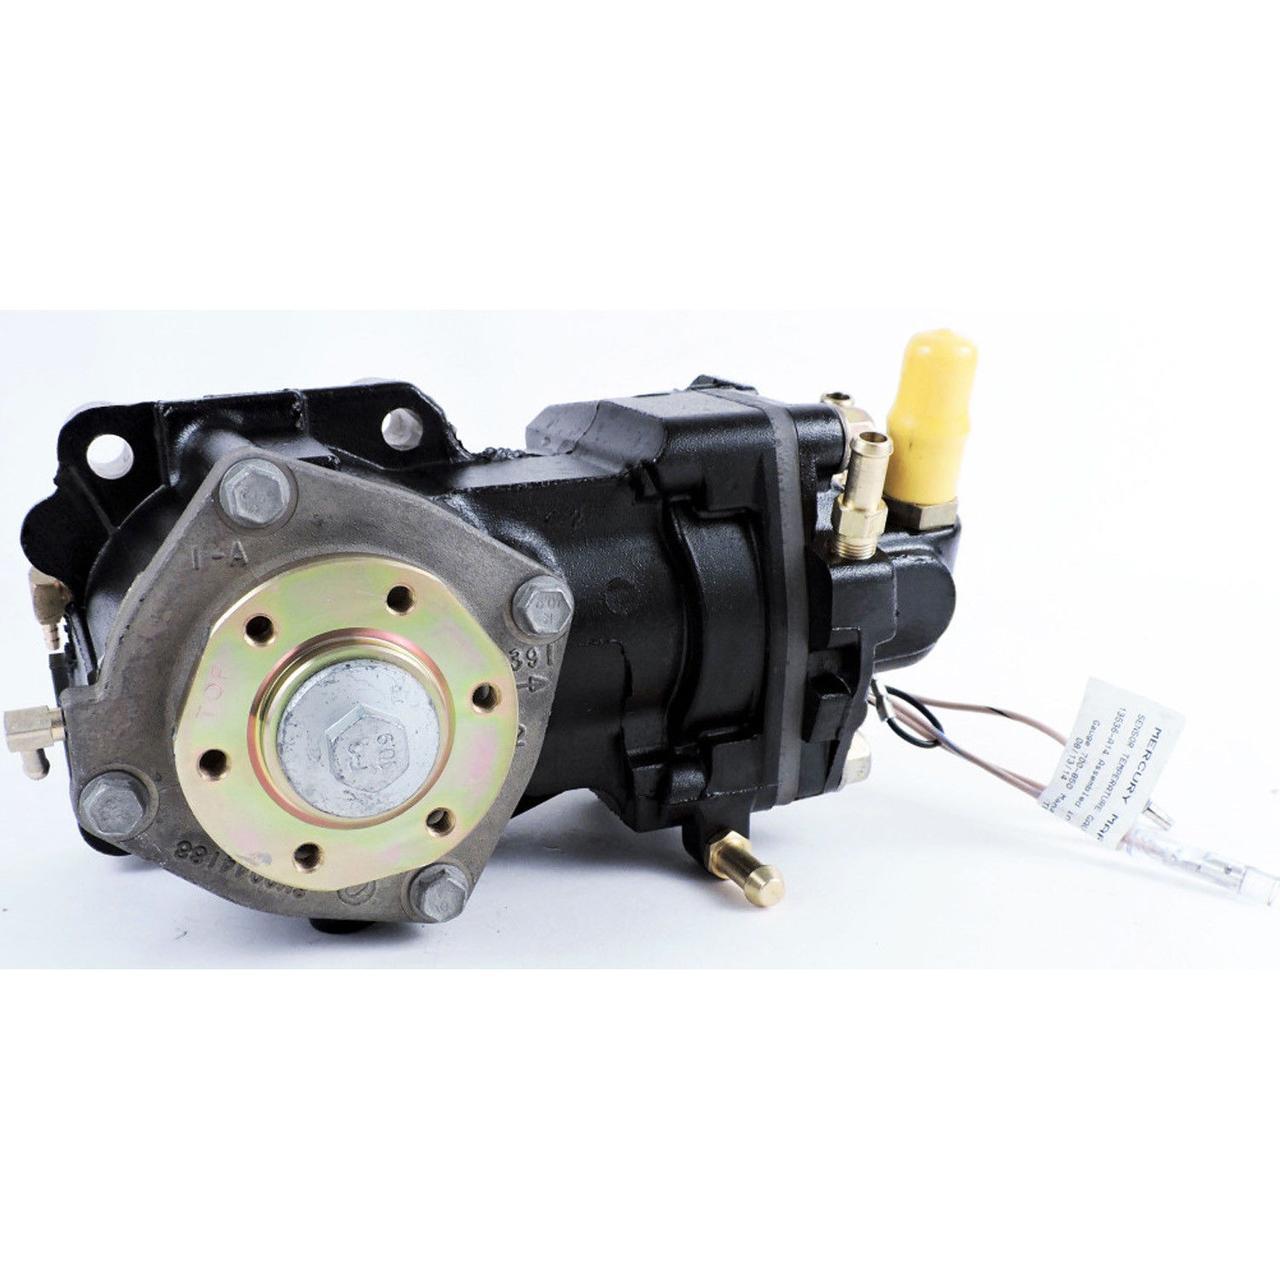 Компрессор двигателя OptiMax 3.0L (200 - 225 л.с.) [8M0060052]